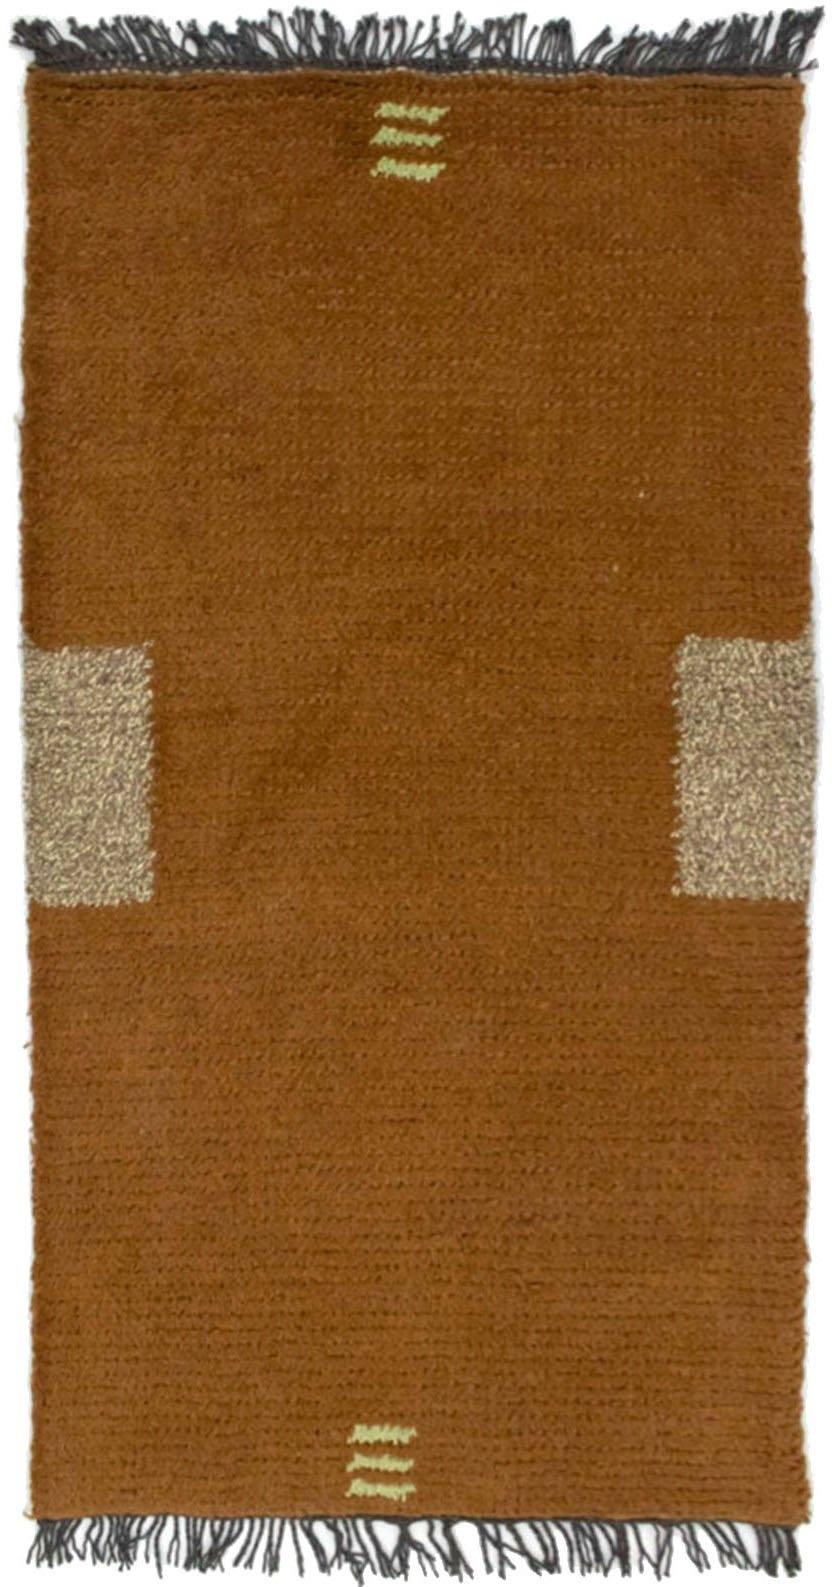 morgenland wollen kleed Nepal Teppich handgeknüpft braun handgeknoopt in de webshop van OTTO kopen